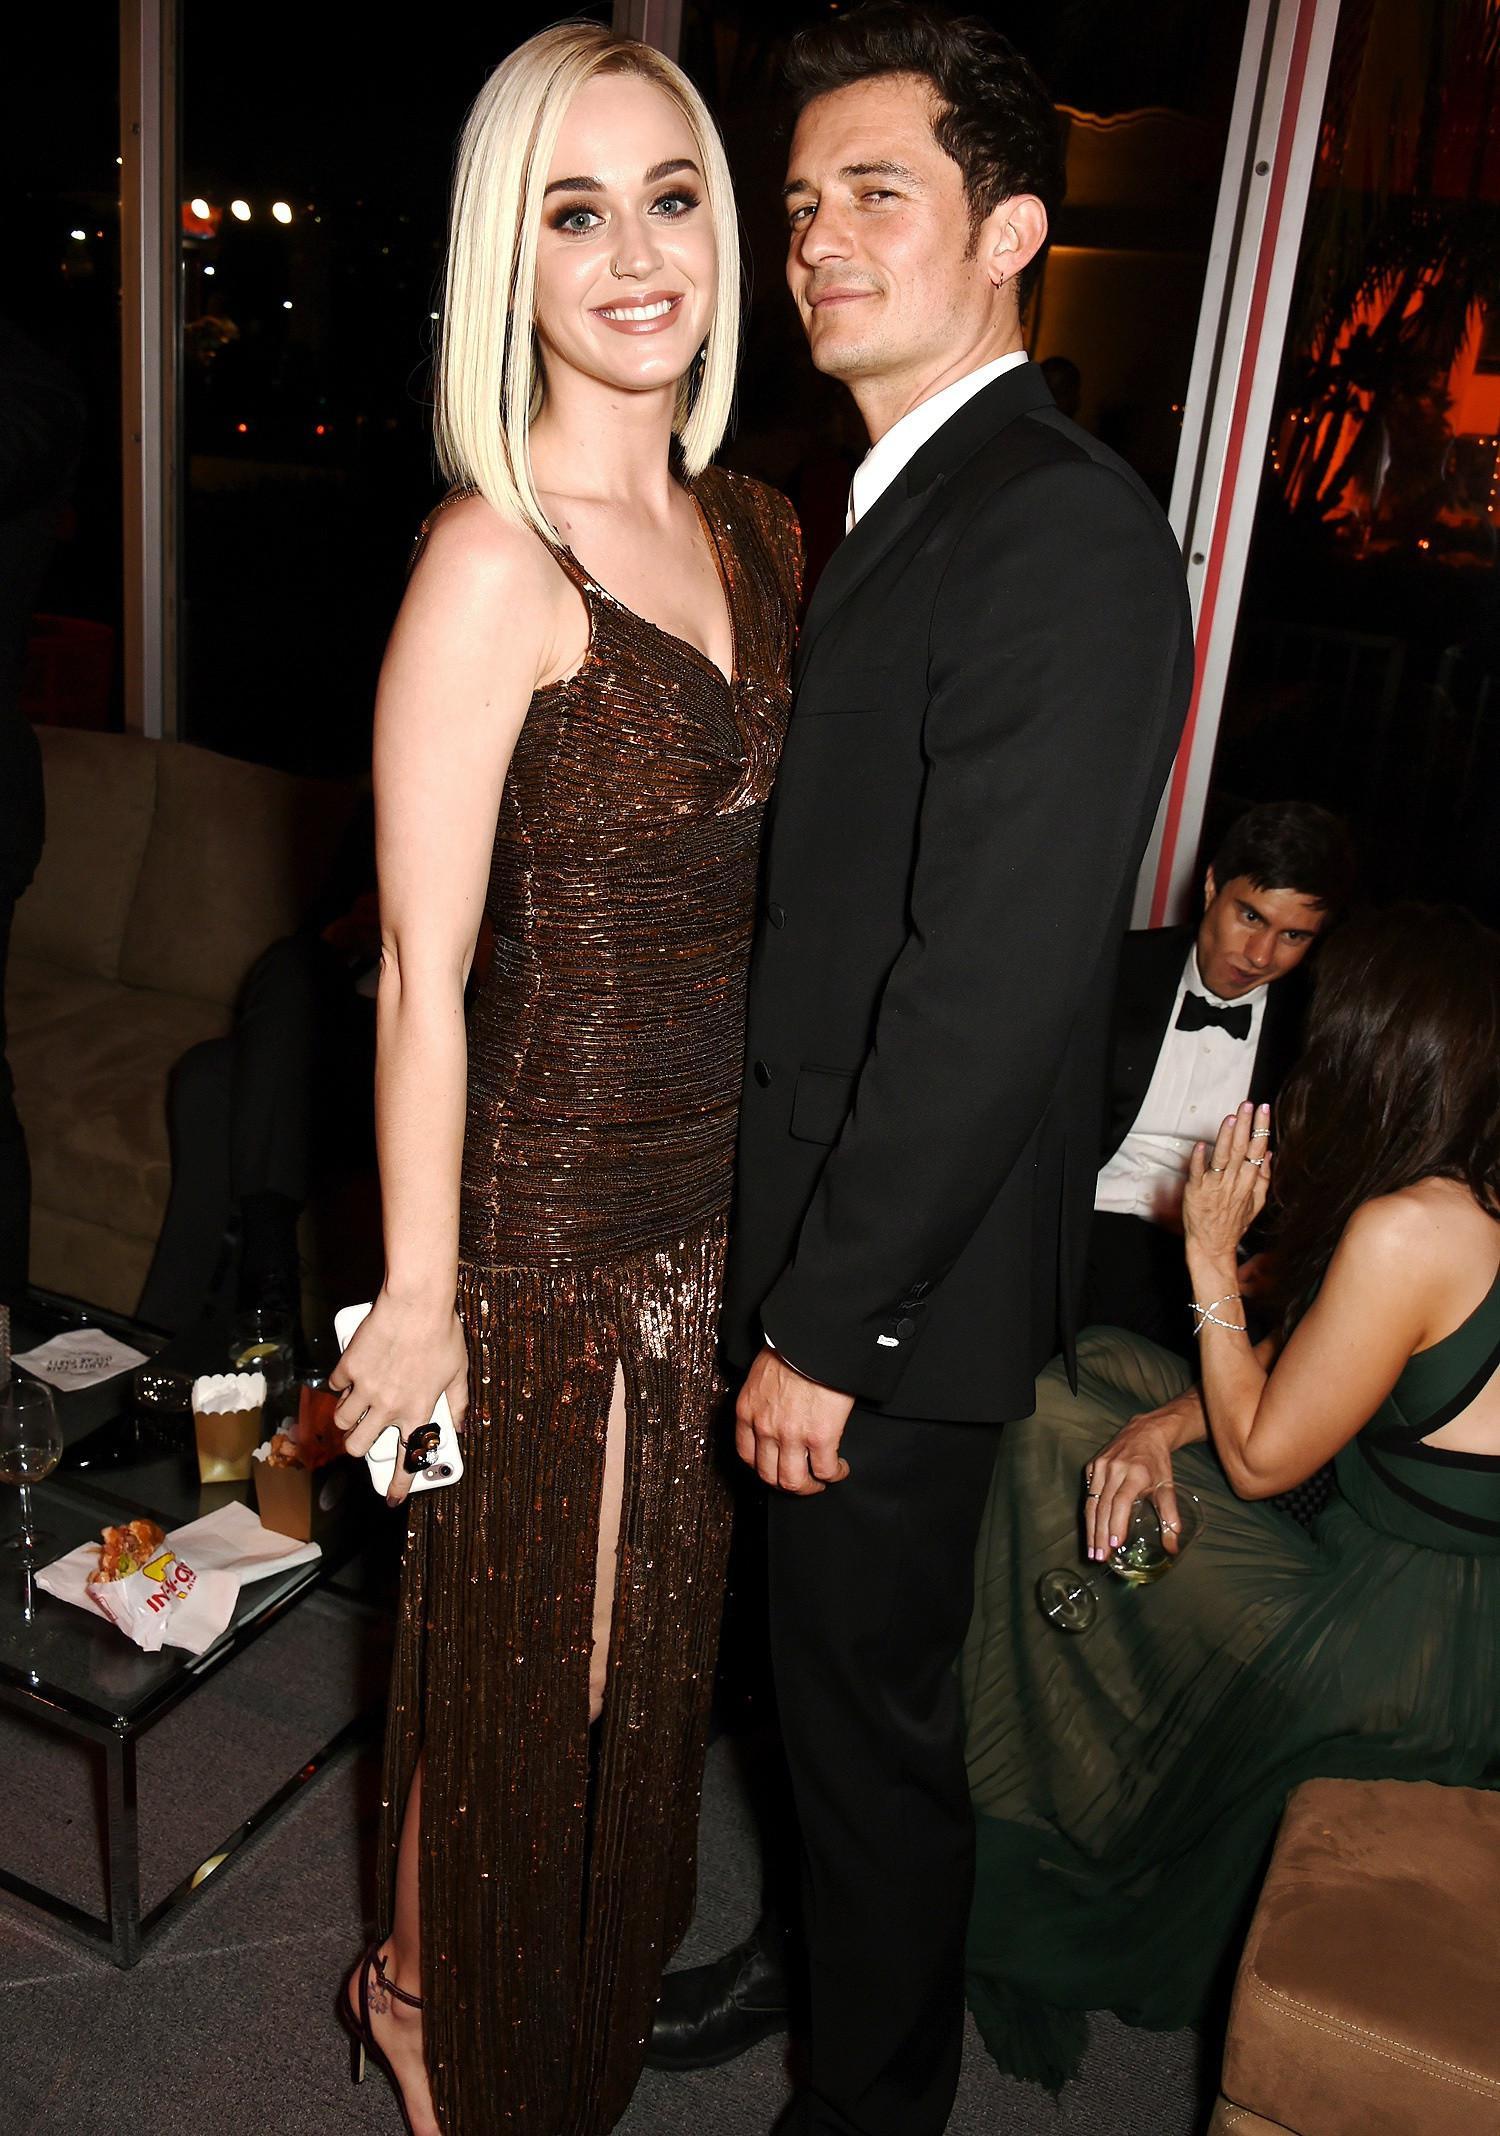 Katy Perry bersama Orlando Bloom, pria yang pernah menjadi kekaishnya (E!)